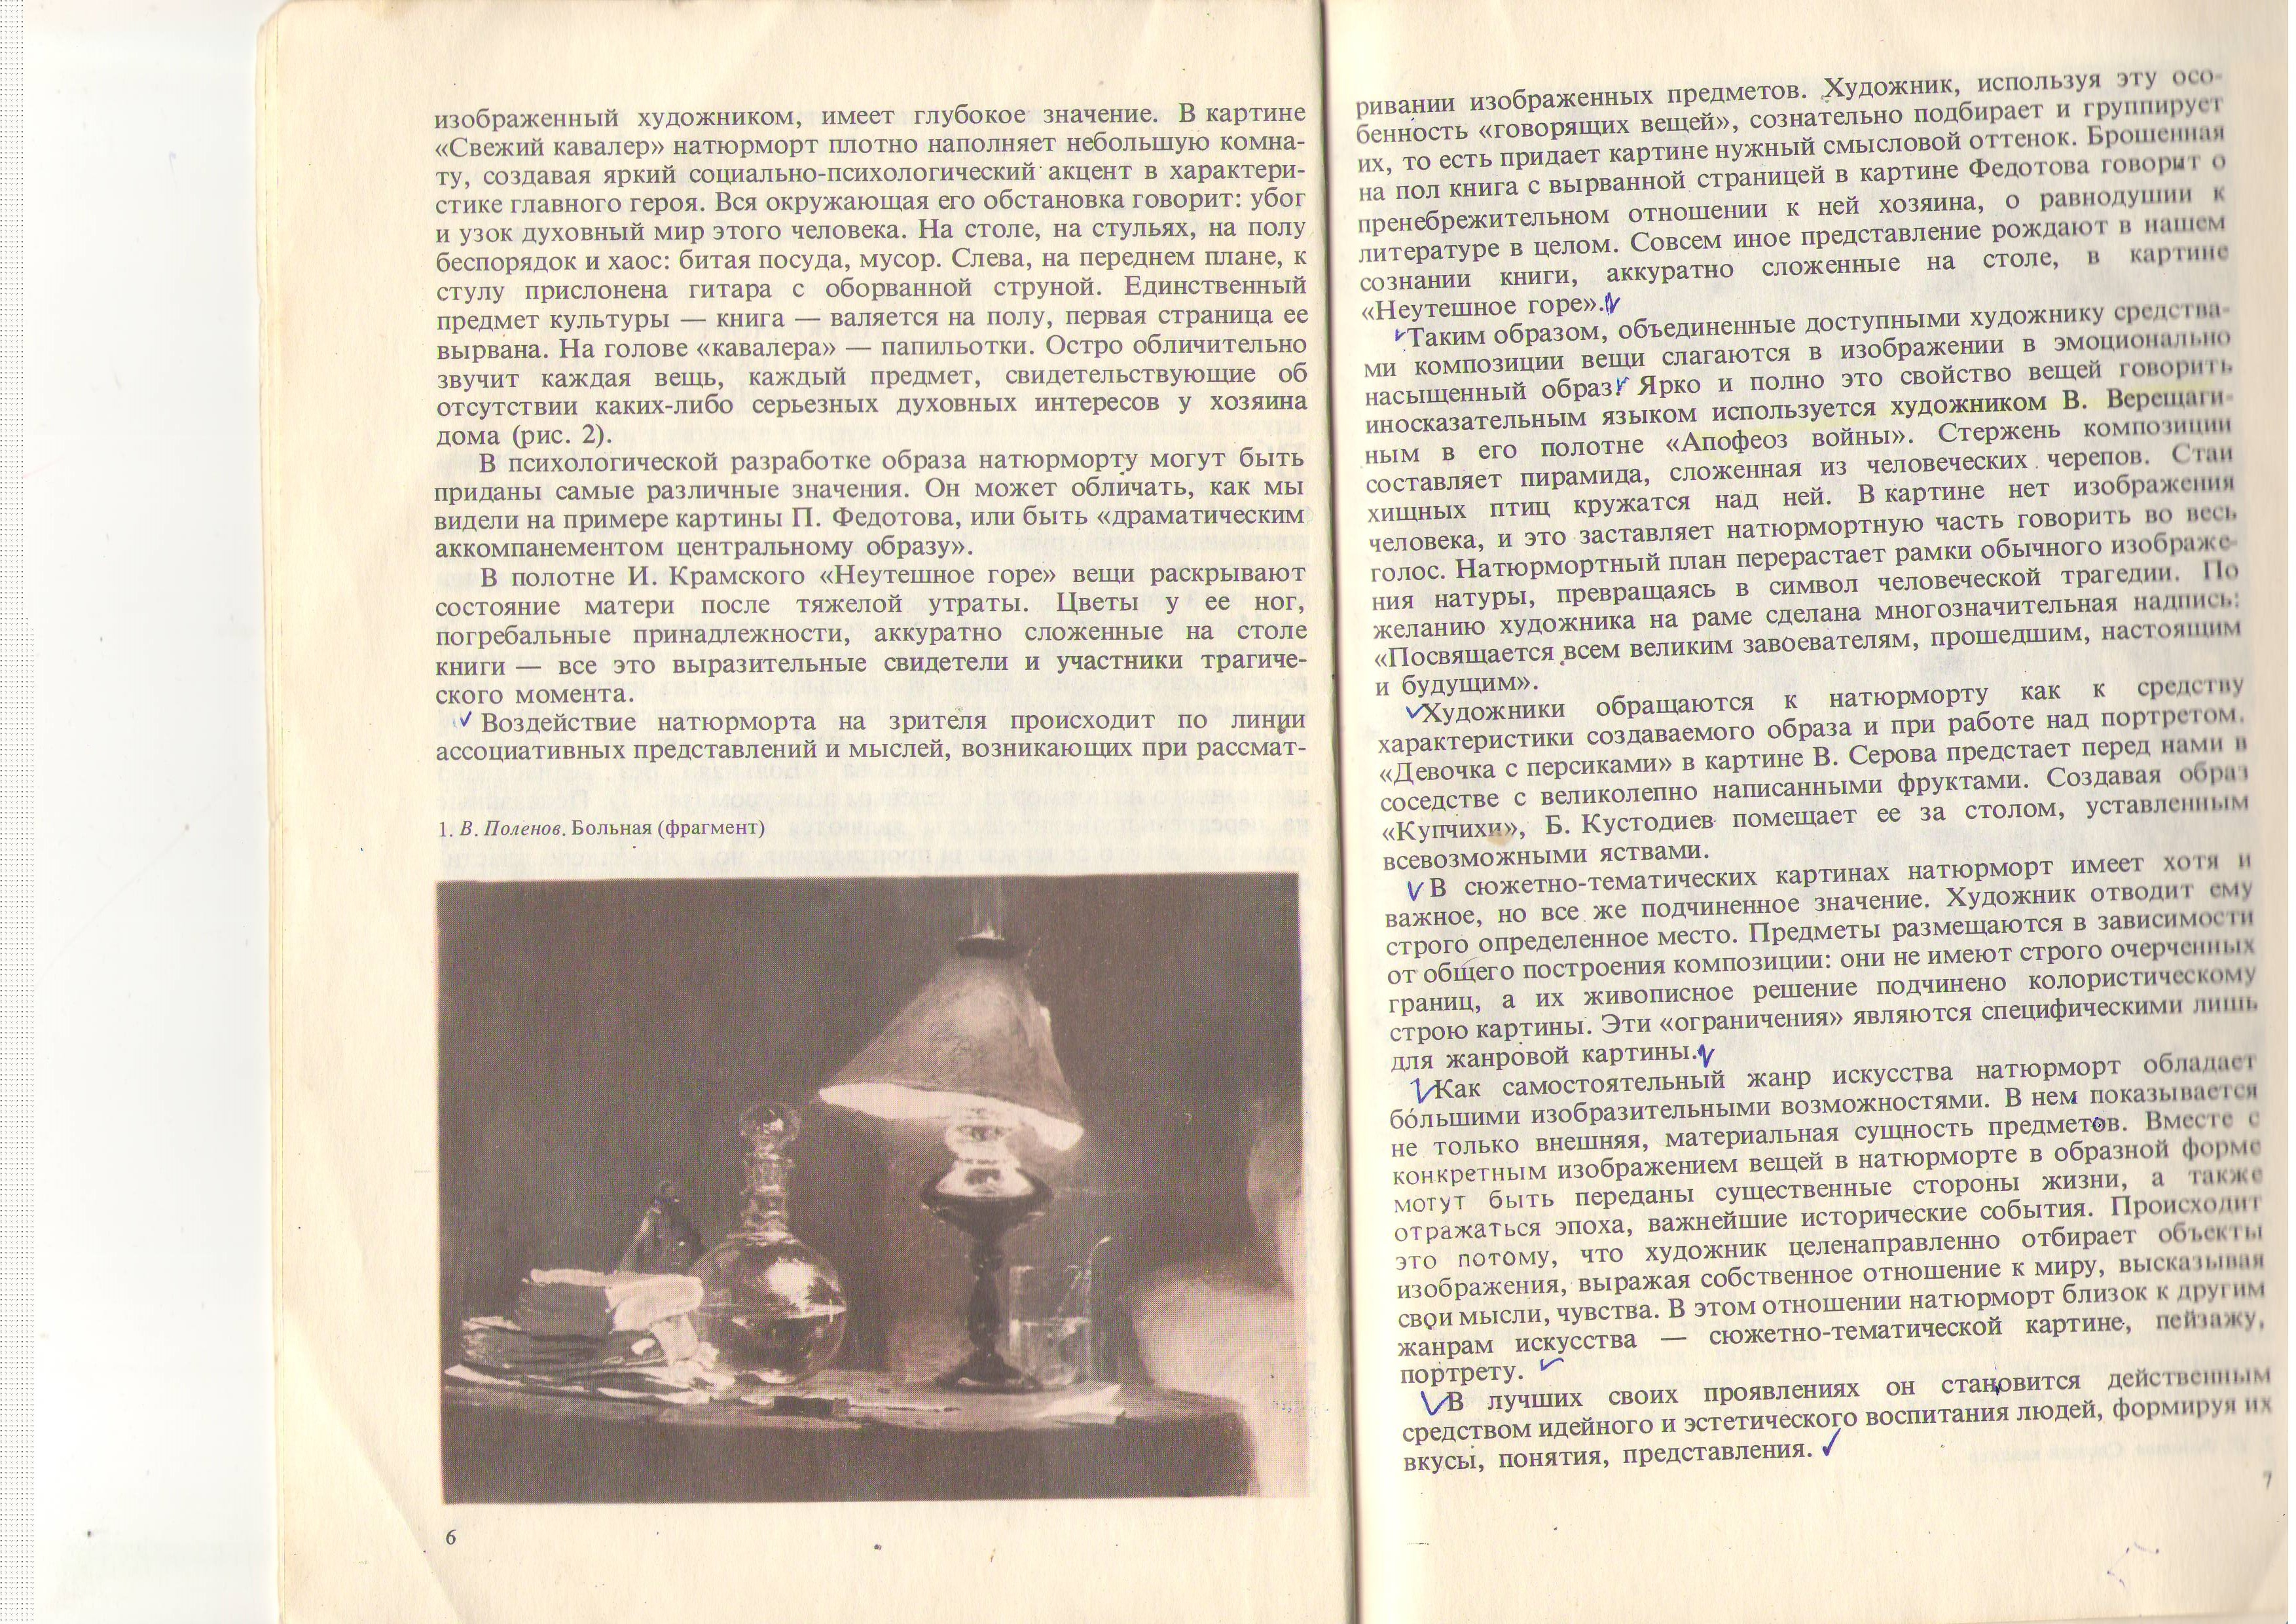 D:\Мои документы\МЕТОДИЧЕСКИЙ СОВЕТ\Методические работы преподавателей\Акрамов Ш.Я\рис. 1.JPG